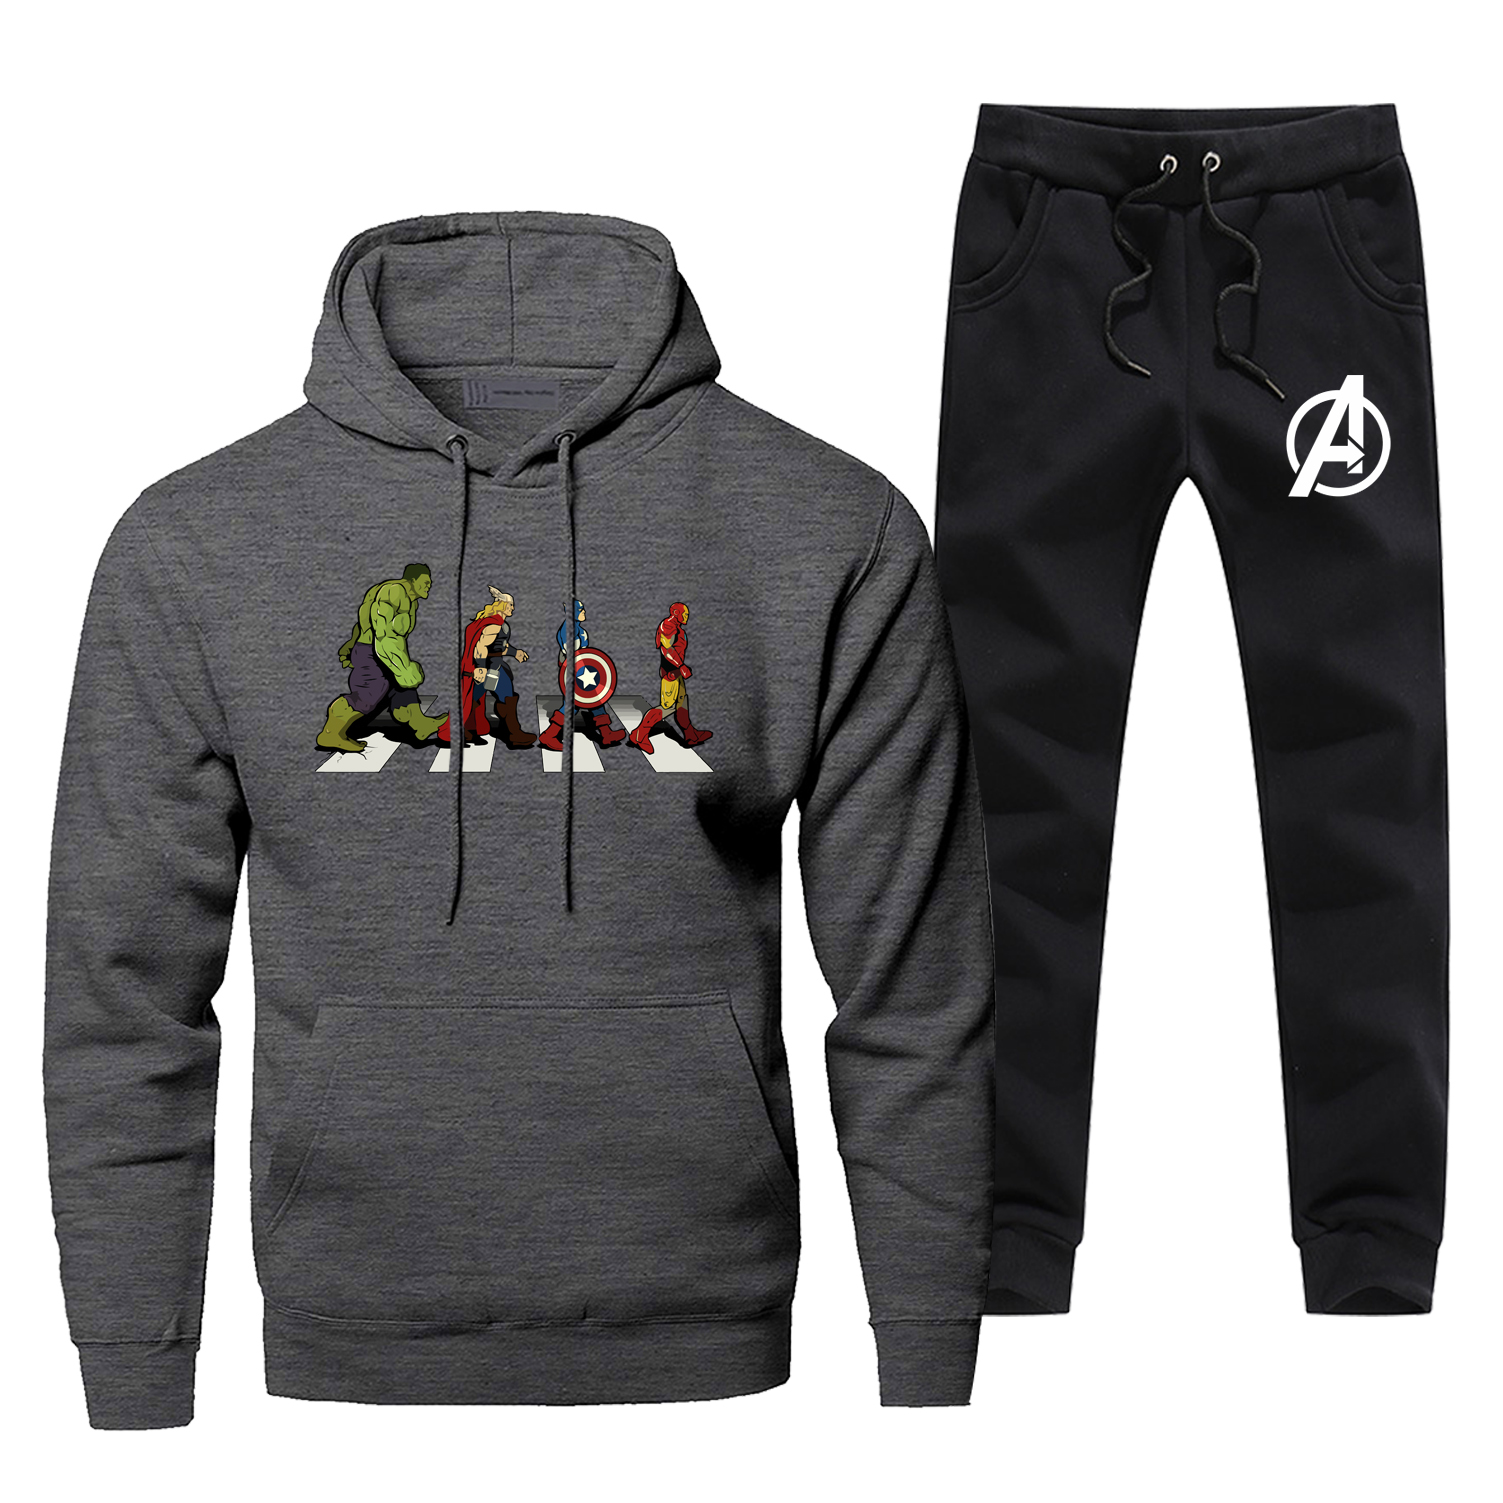 The Avengers Funny Print Hoodies Sweatshirts Iron Man Casual Mens Sets Fleece Fashion Sweatpants 2019 Winter Warm Chandal Hombre